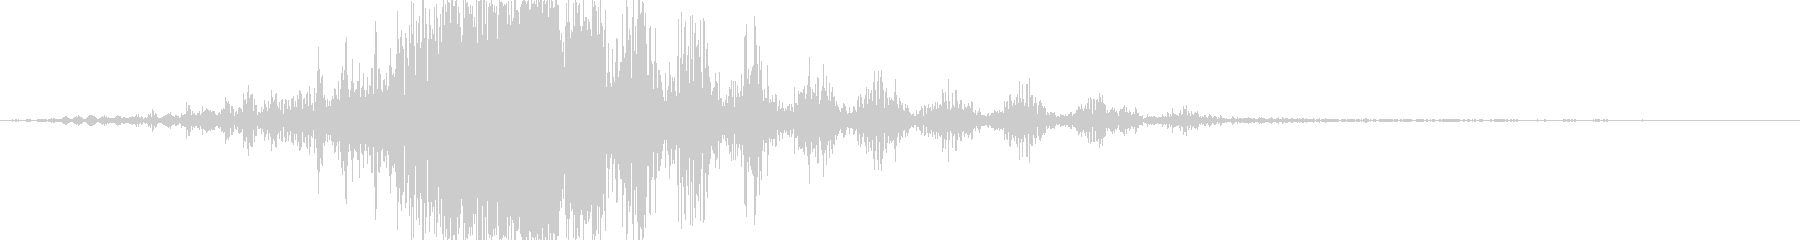 CINEMATIC WHOOSH 04の未再生の波形